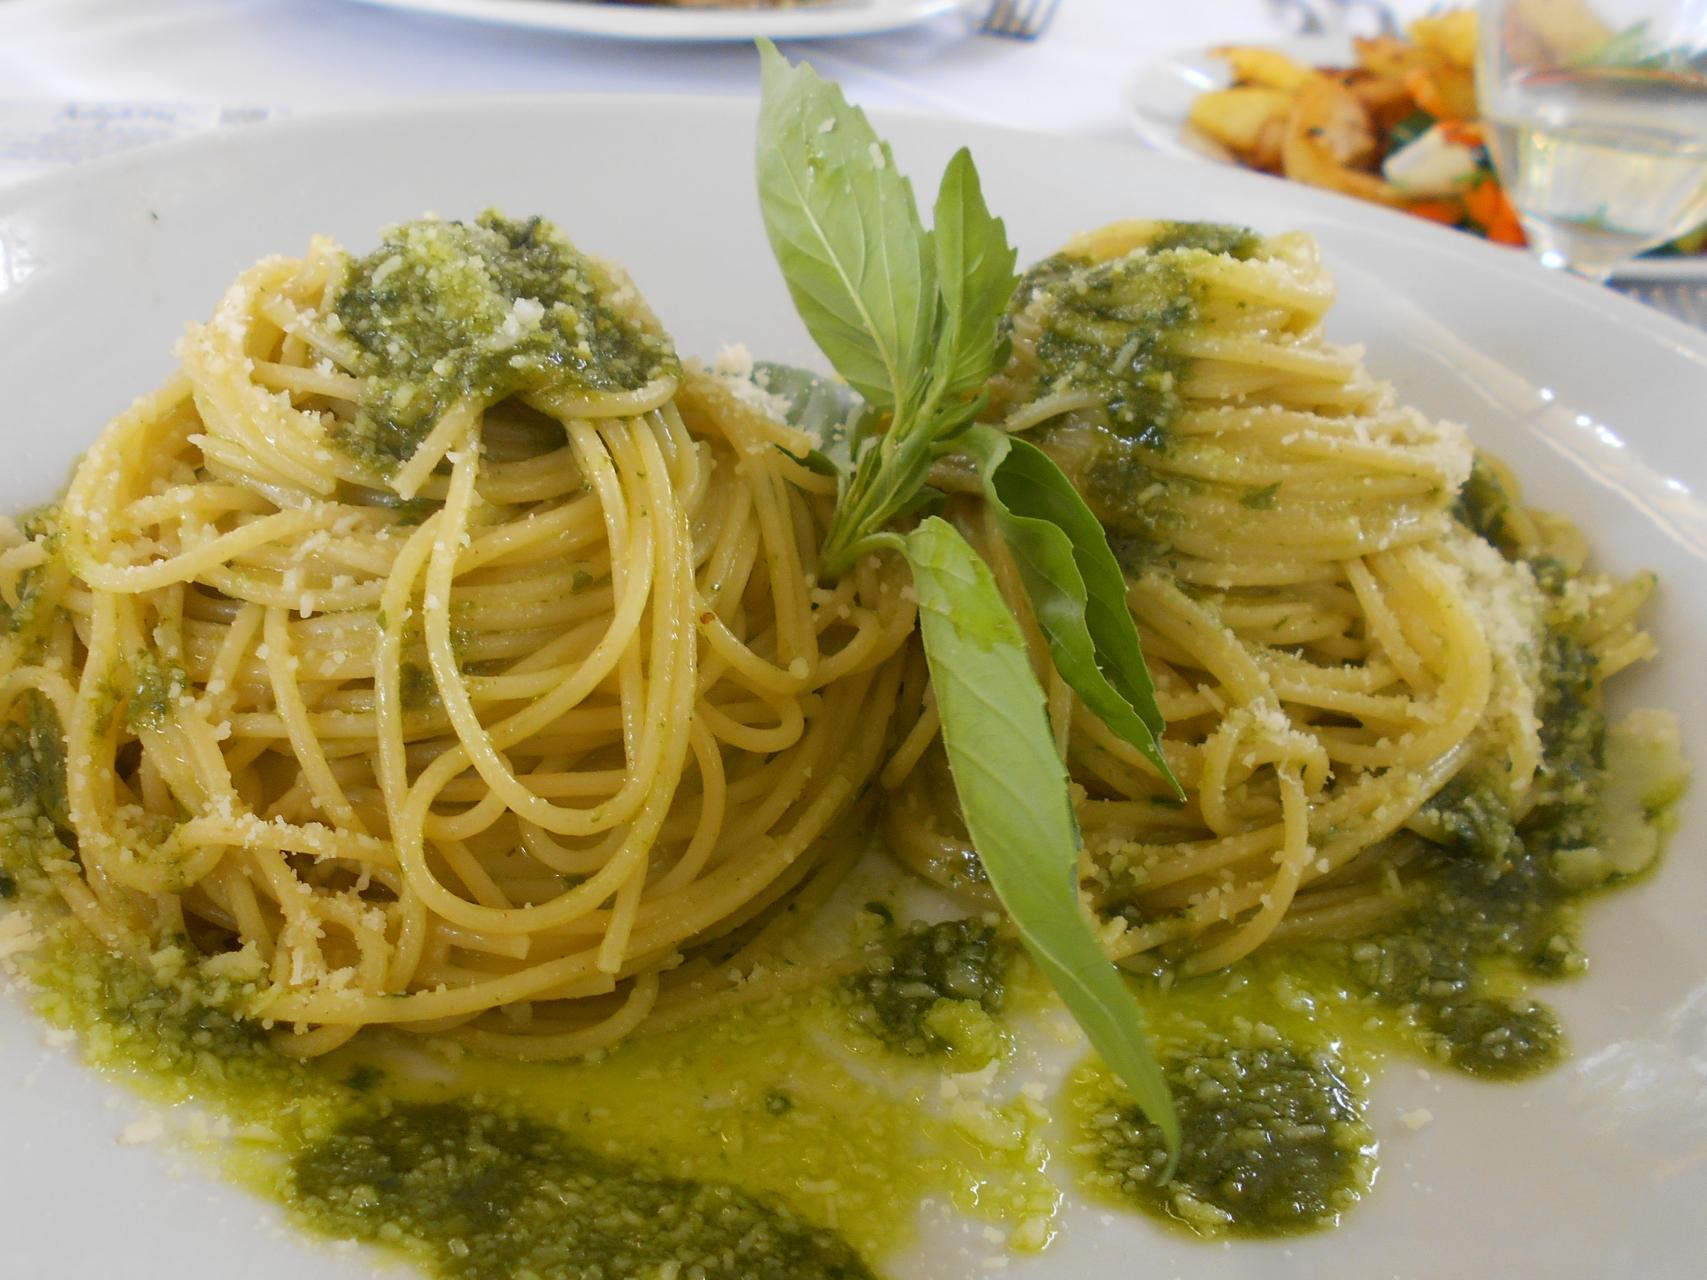 The spaghettini with pesto sauce was also a 10.